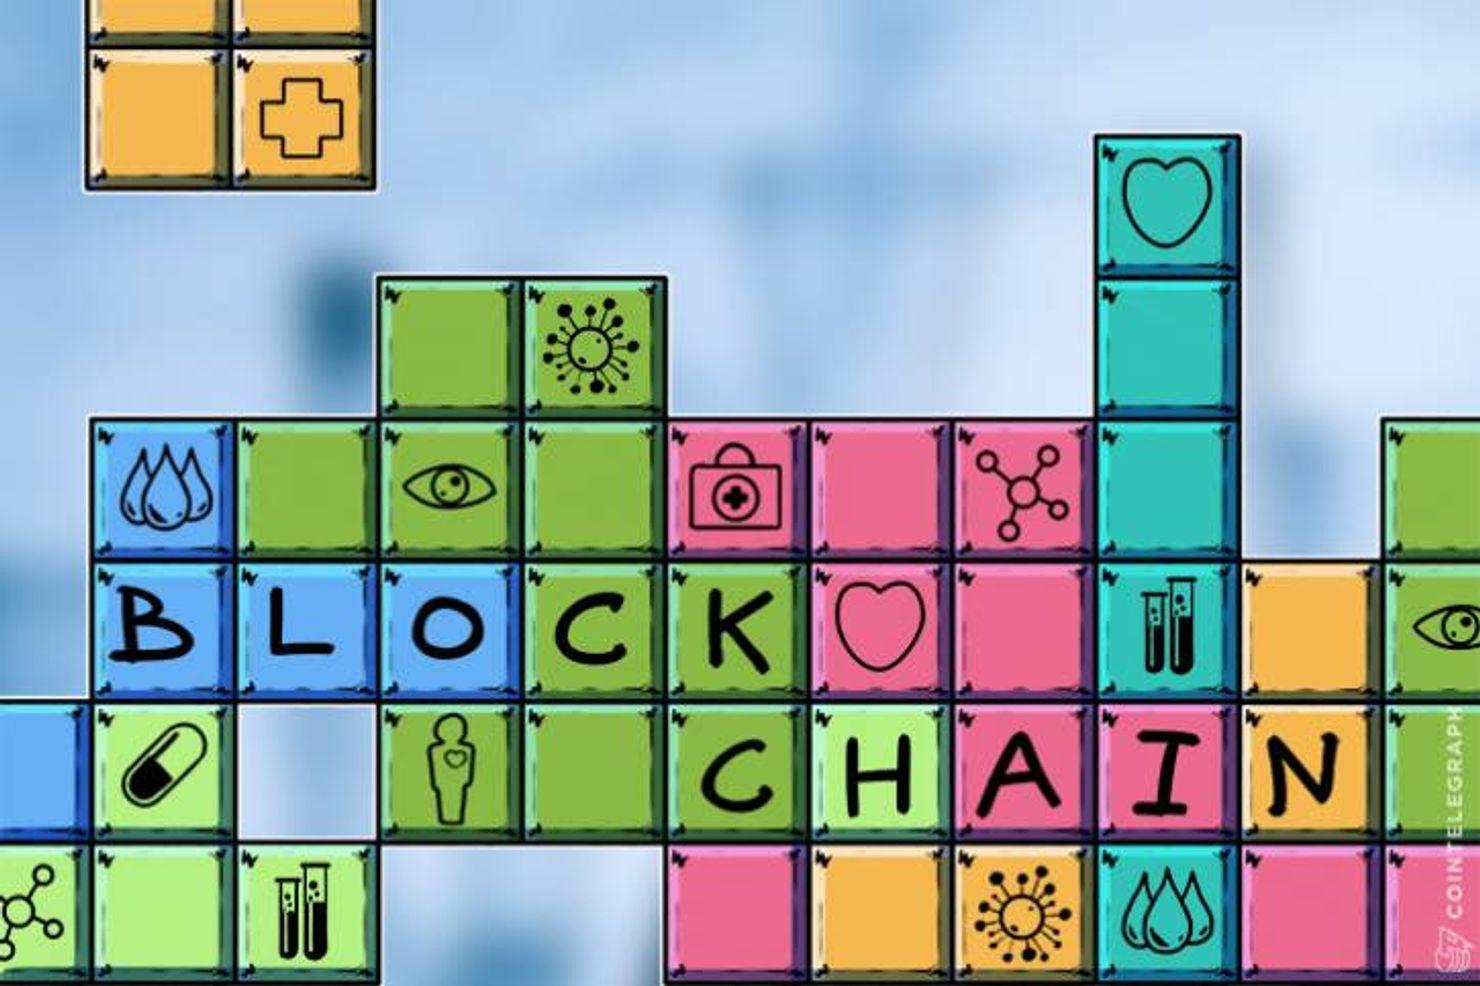 Blockchained Magazine cover image